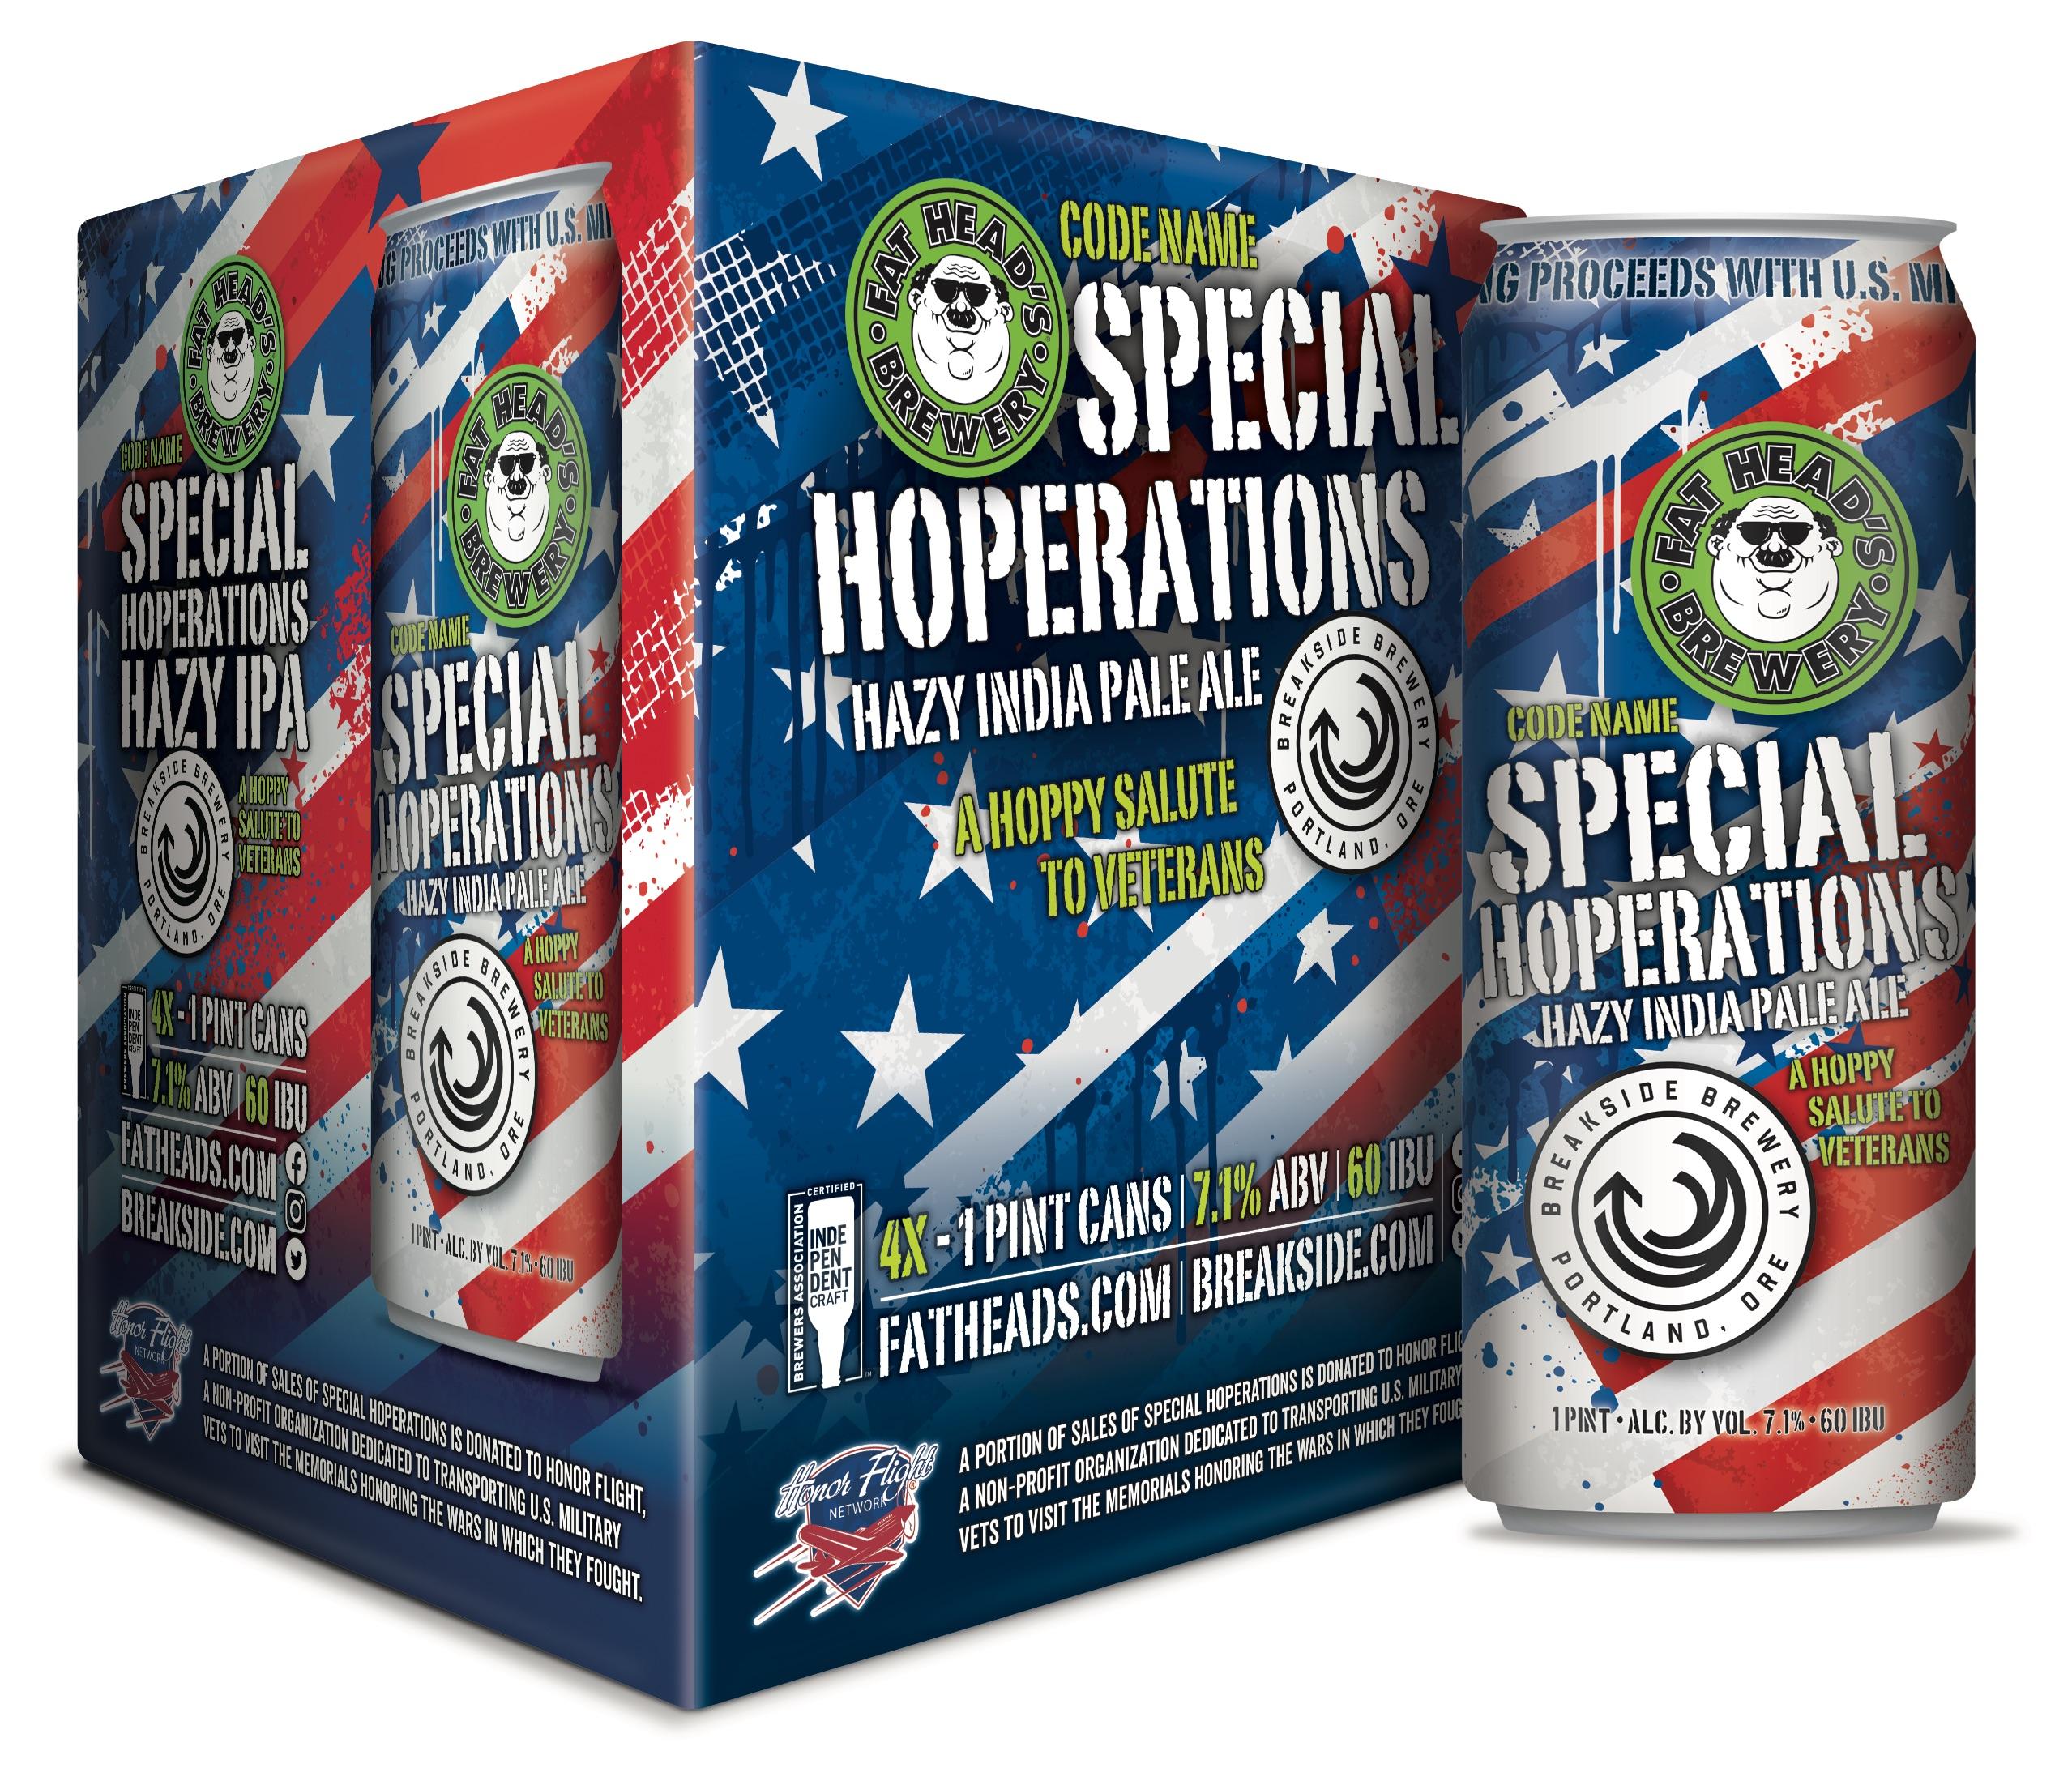 SpecialHoperations